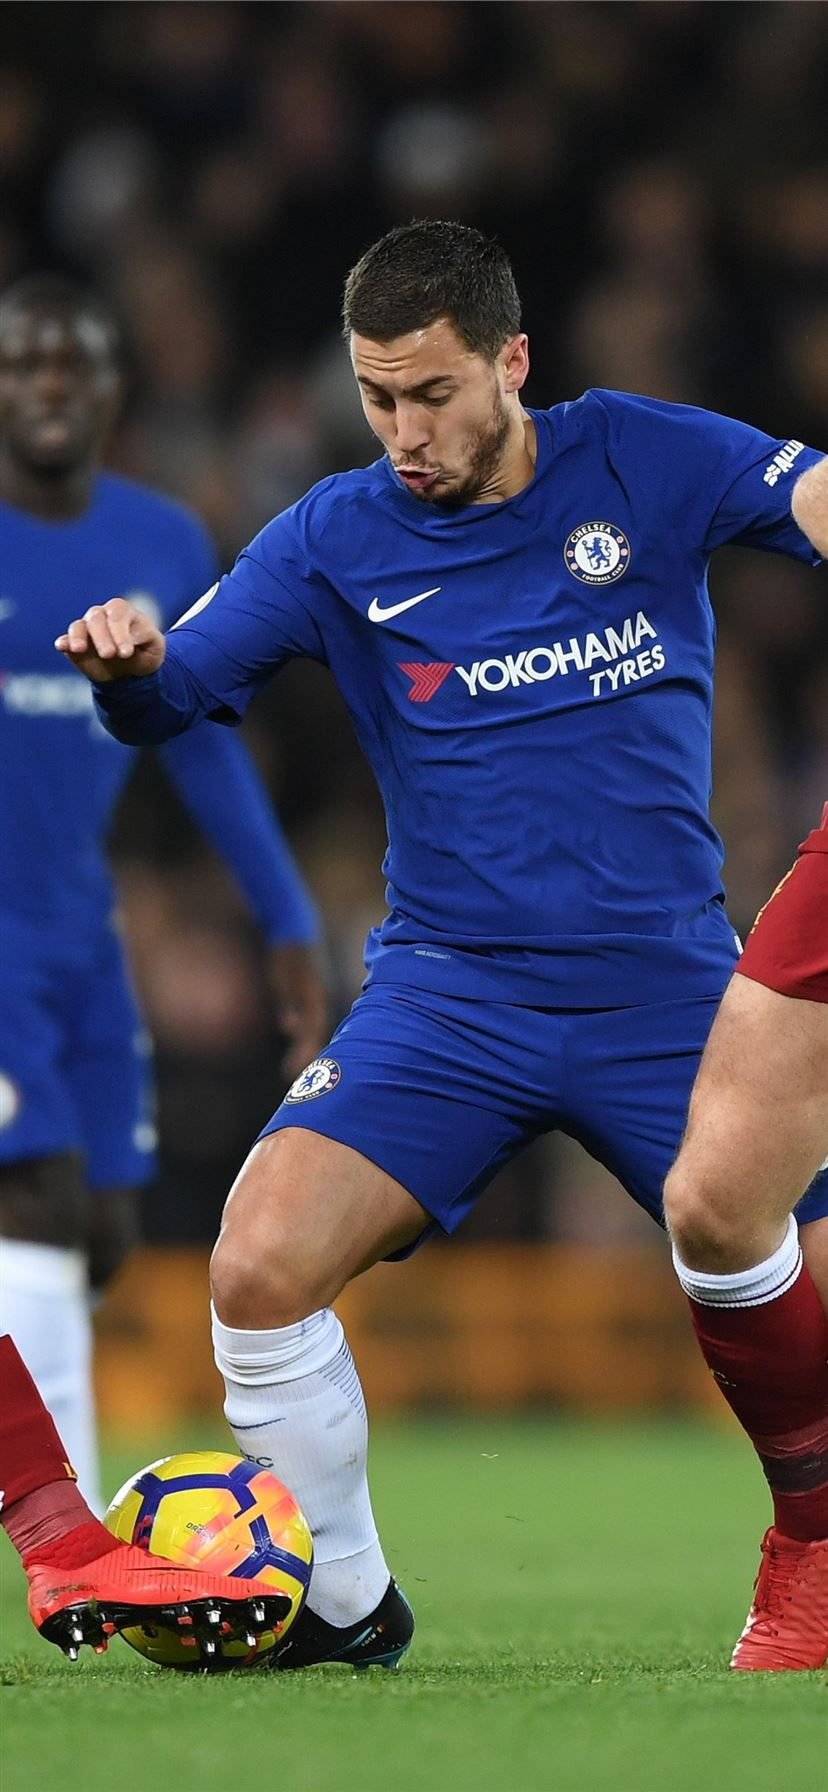 Eden Hazard Chelsea Soccer 4k Sport Page 7 Iphone 11 Wallpapers Free Download